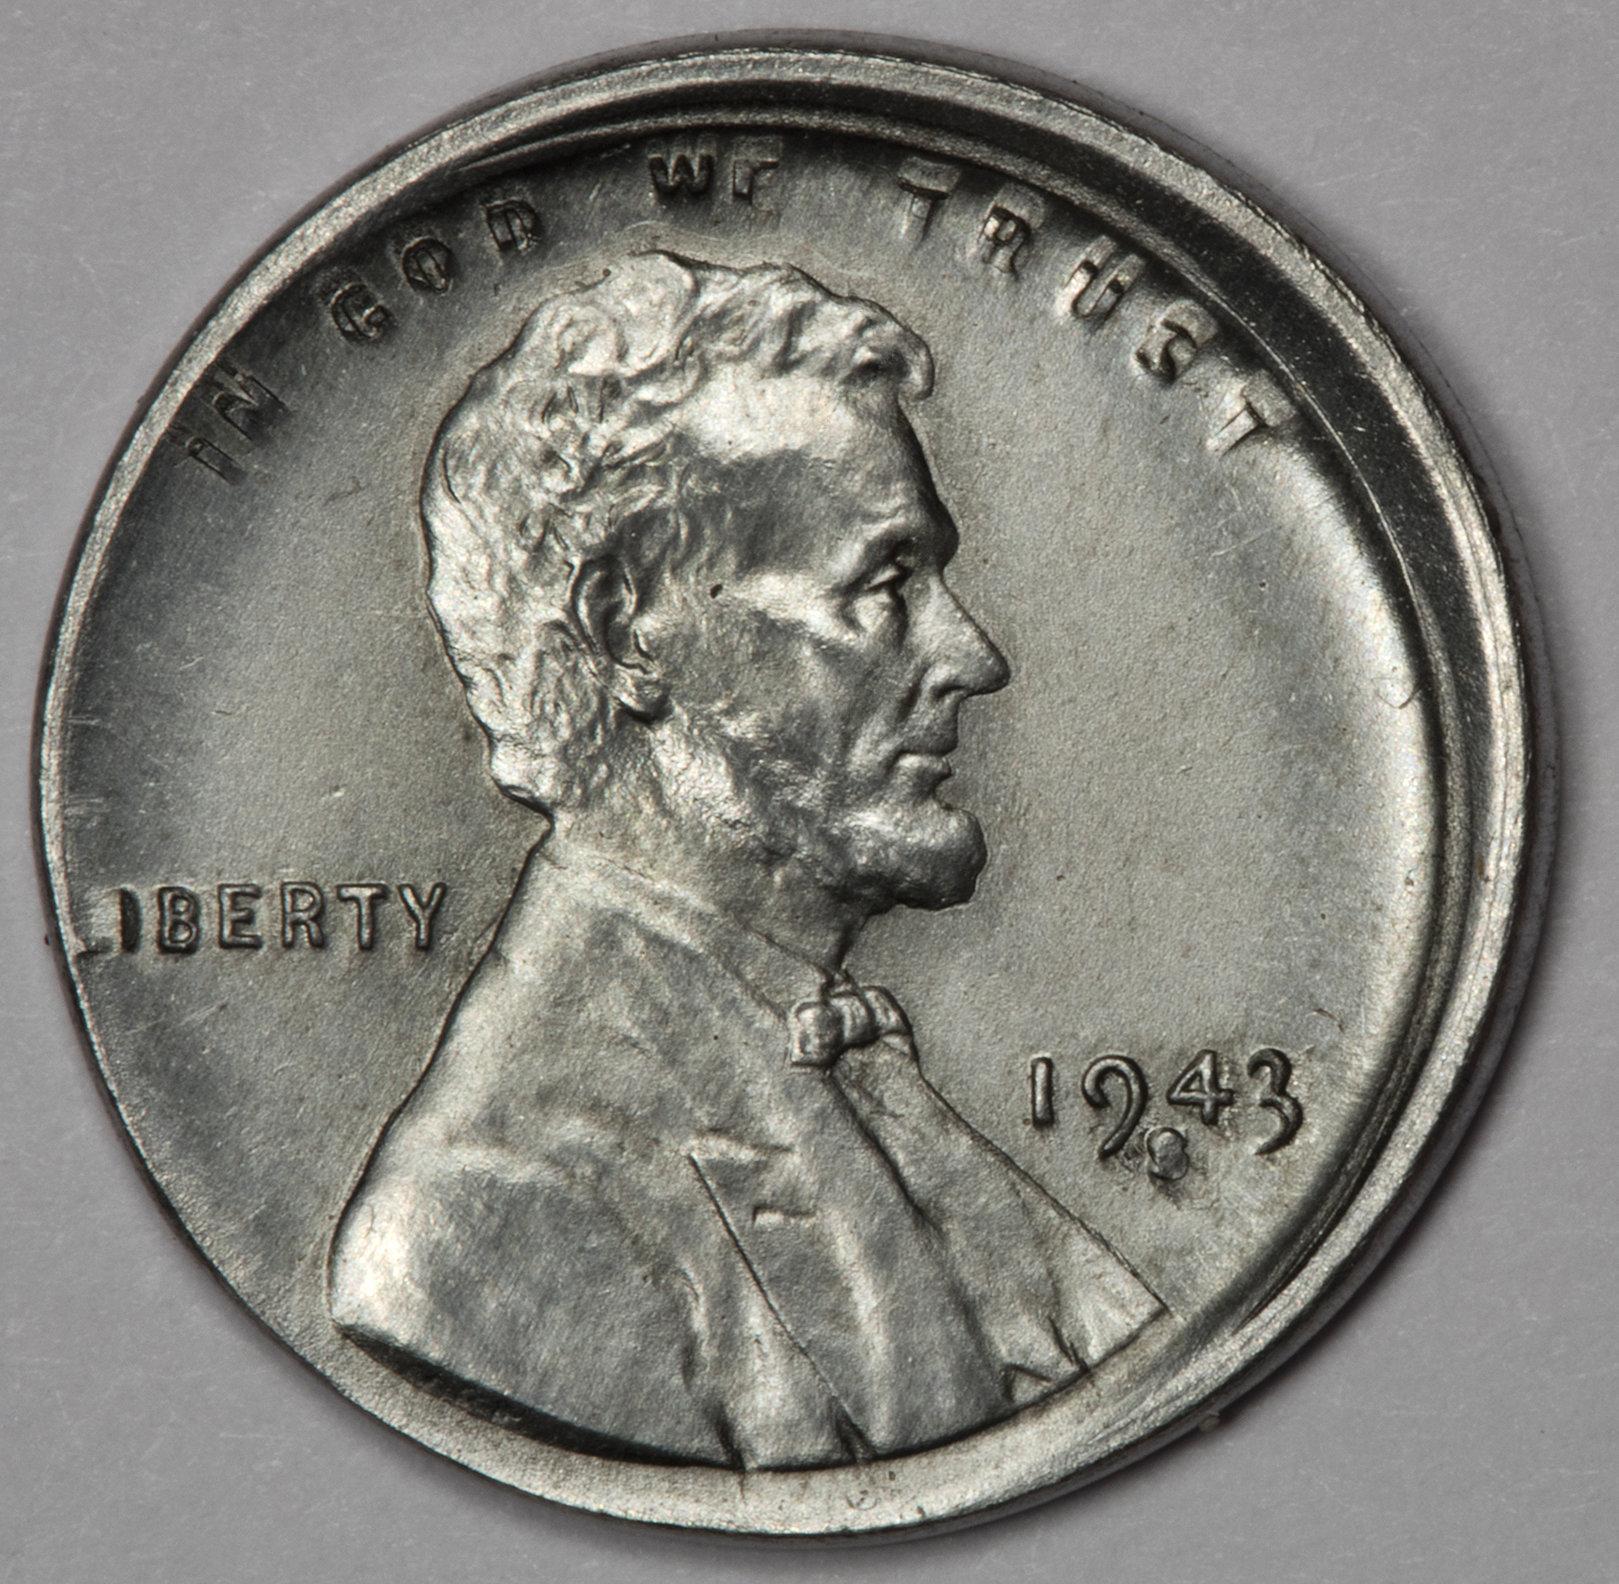 Major Error Coins True Auctions 99 Cent Start On Ebay Photos Collectors Universe